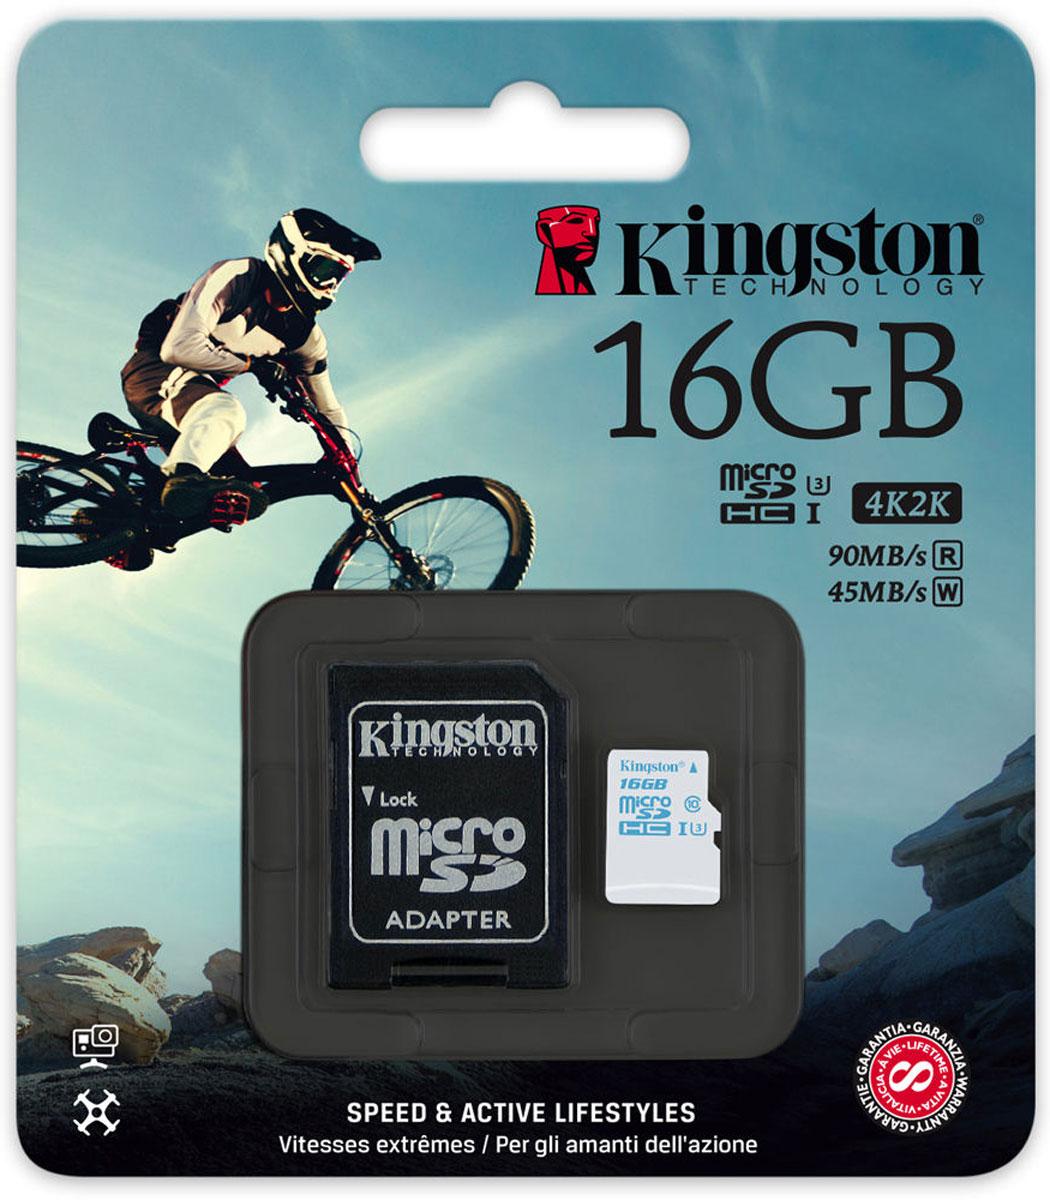 Kingston microSDHC Action Camera Class 10 U3 UHS-I 16GB карта памяти с адаптером